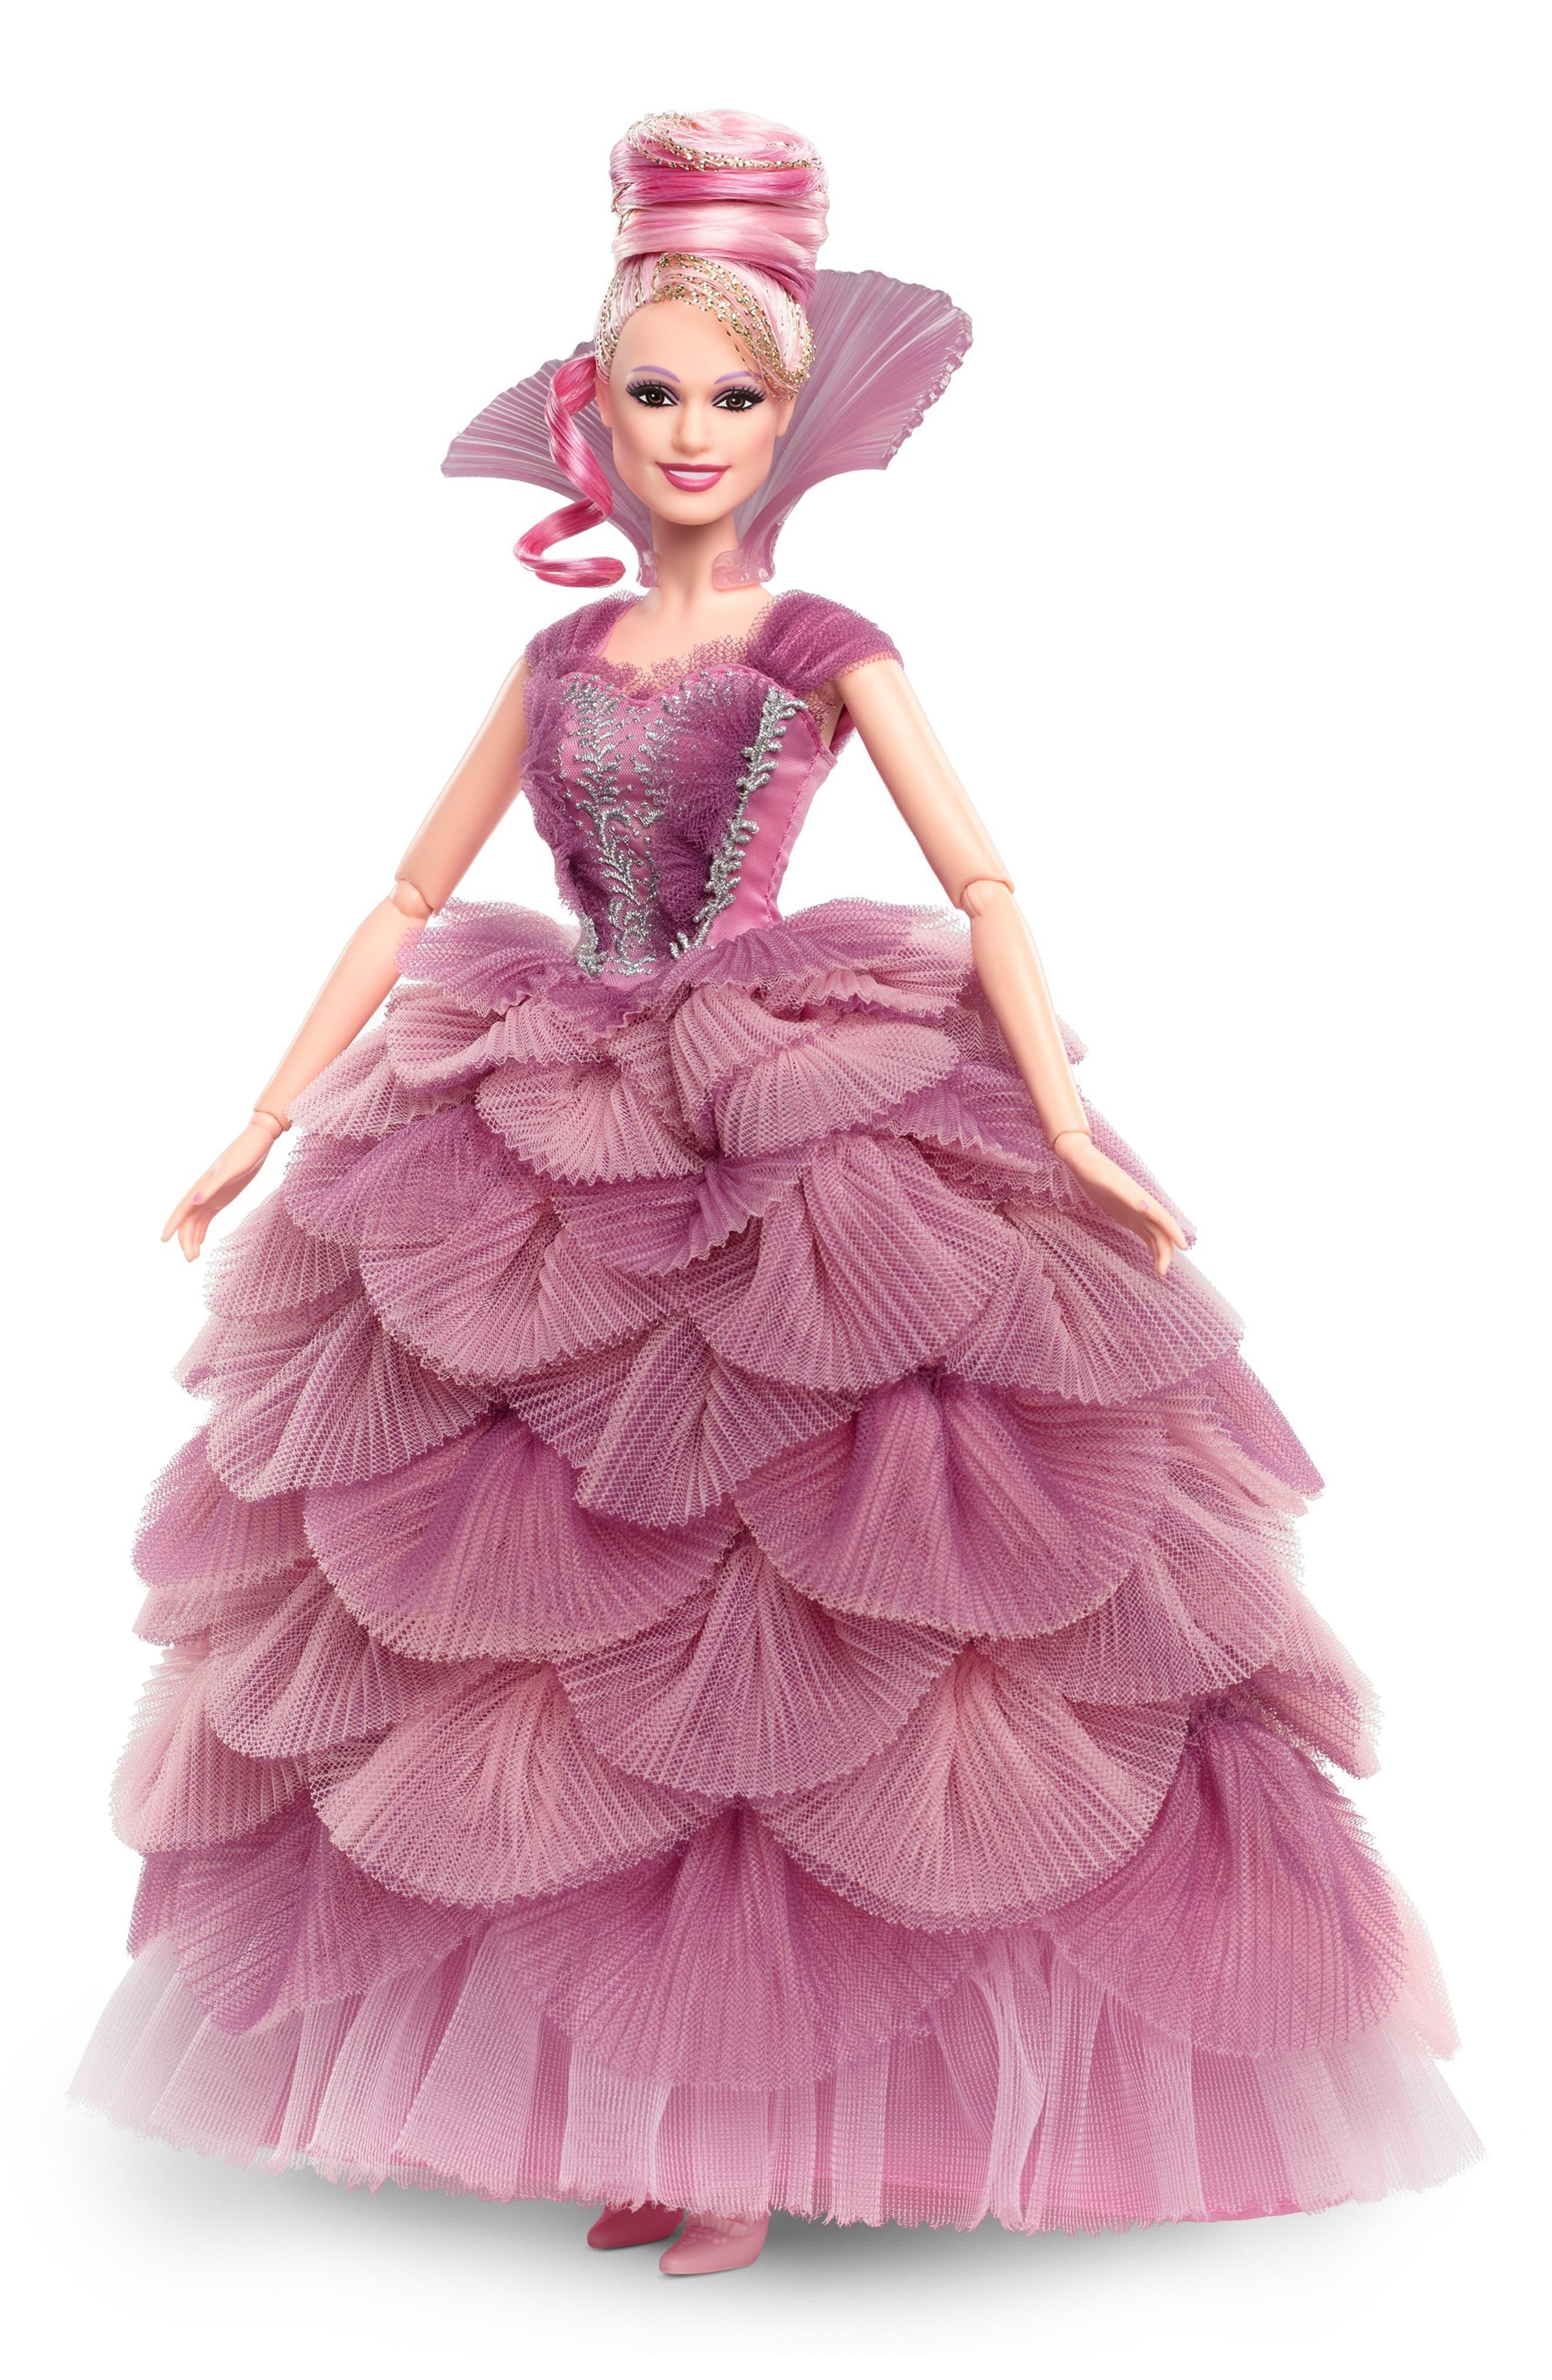 MATTEL,                             Disney<sup>®</sup> The Nutcracker & the Four Realms Sugar Plum Fairy Barbie<sup>®</sup> Doll,                             Main thumbnail 1, color,                             960